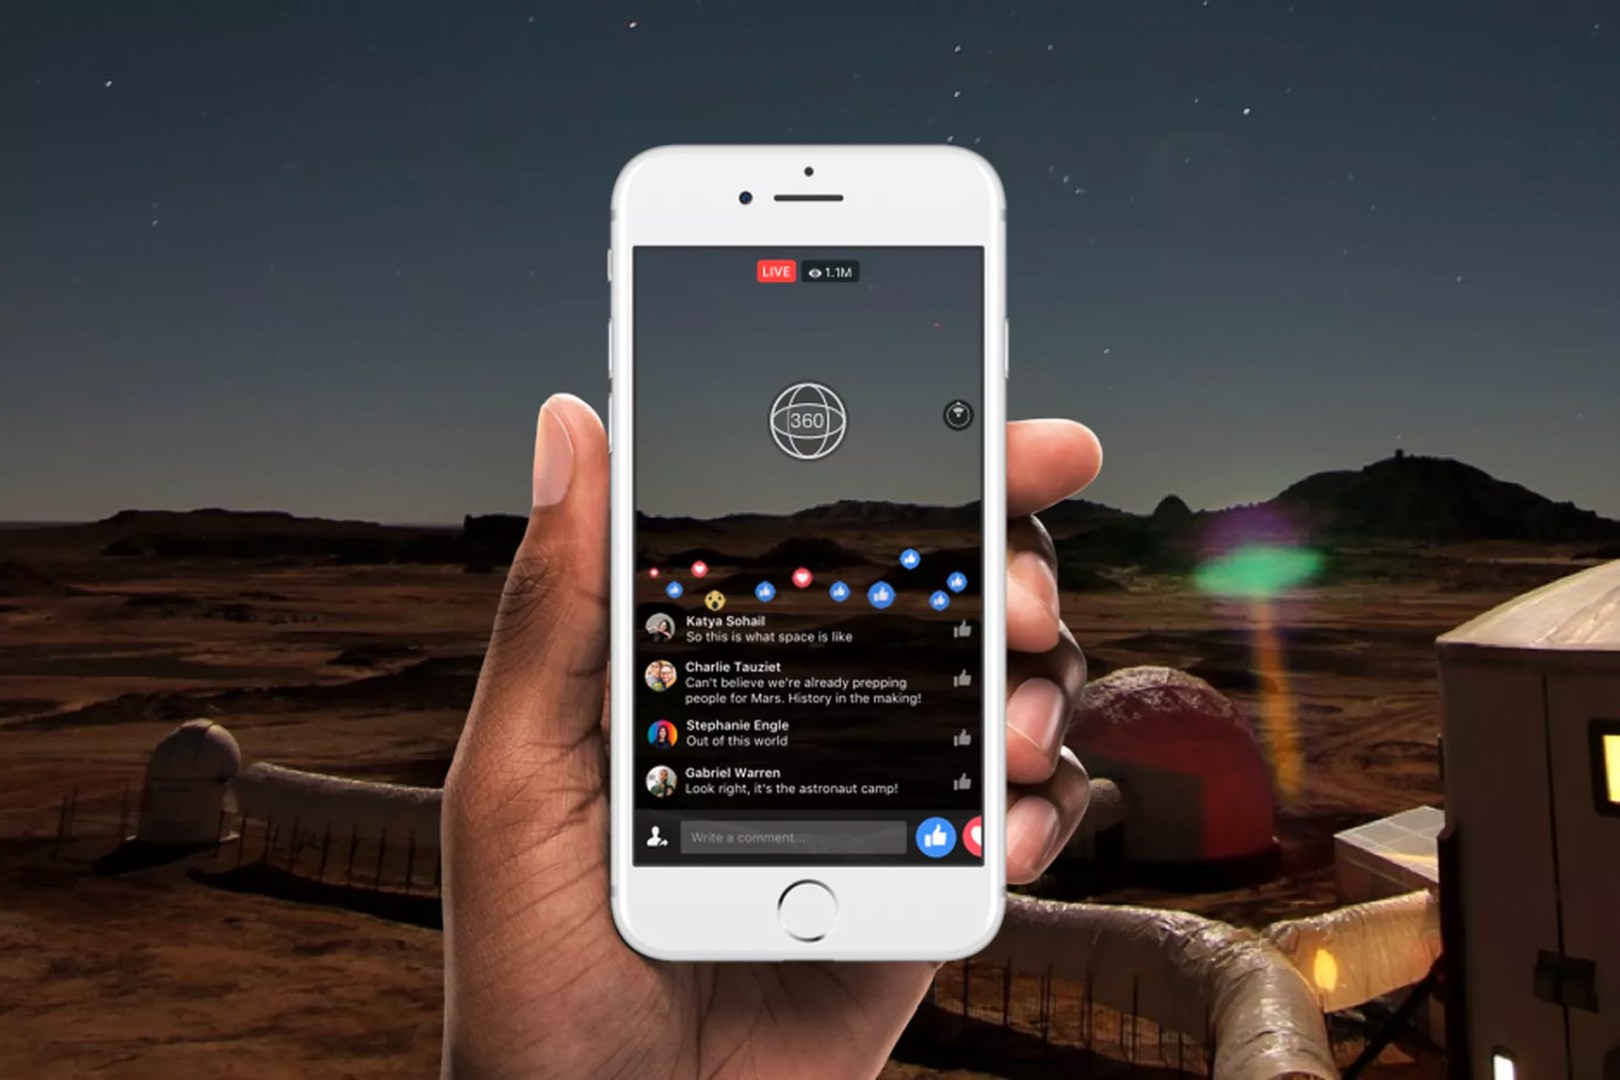 Live 360 Facebook Video